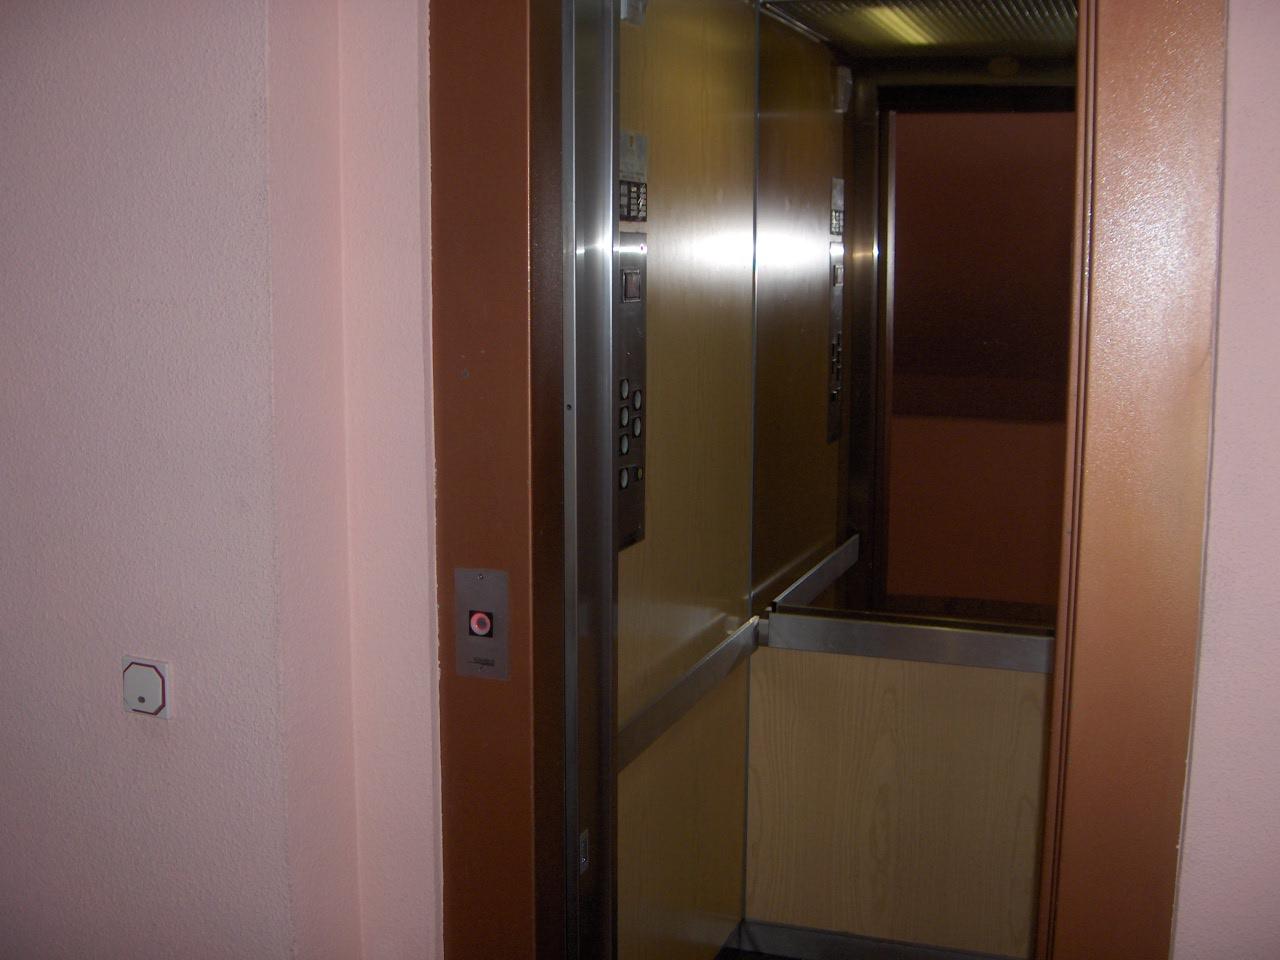 instalación de ascensores en comunidades